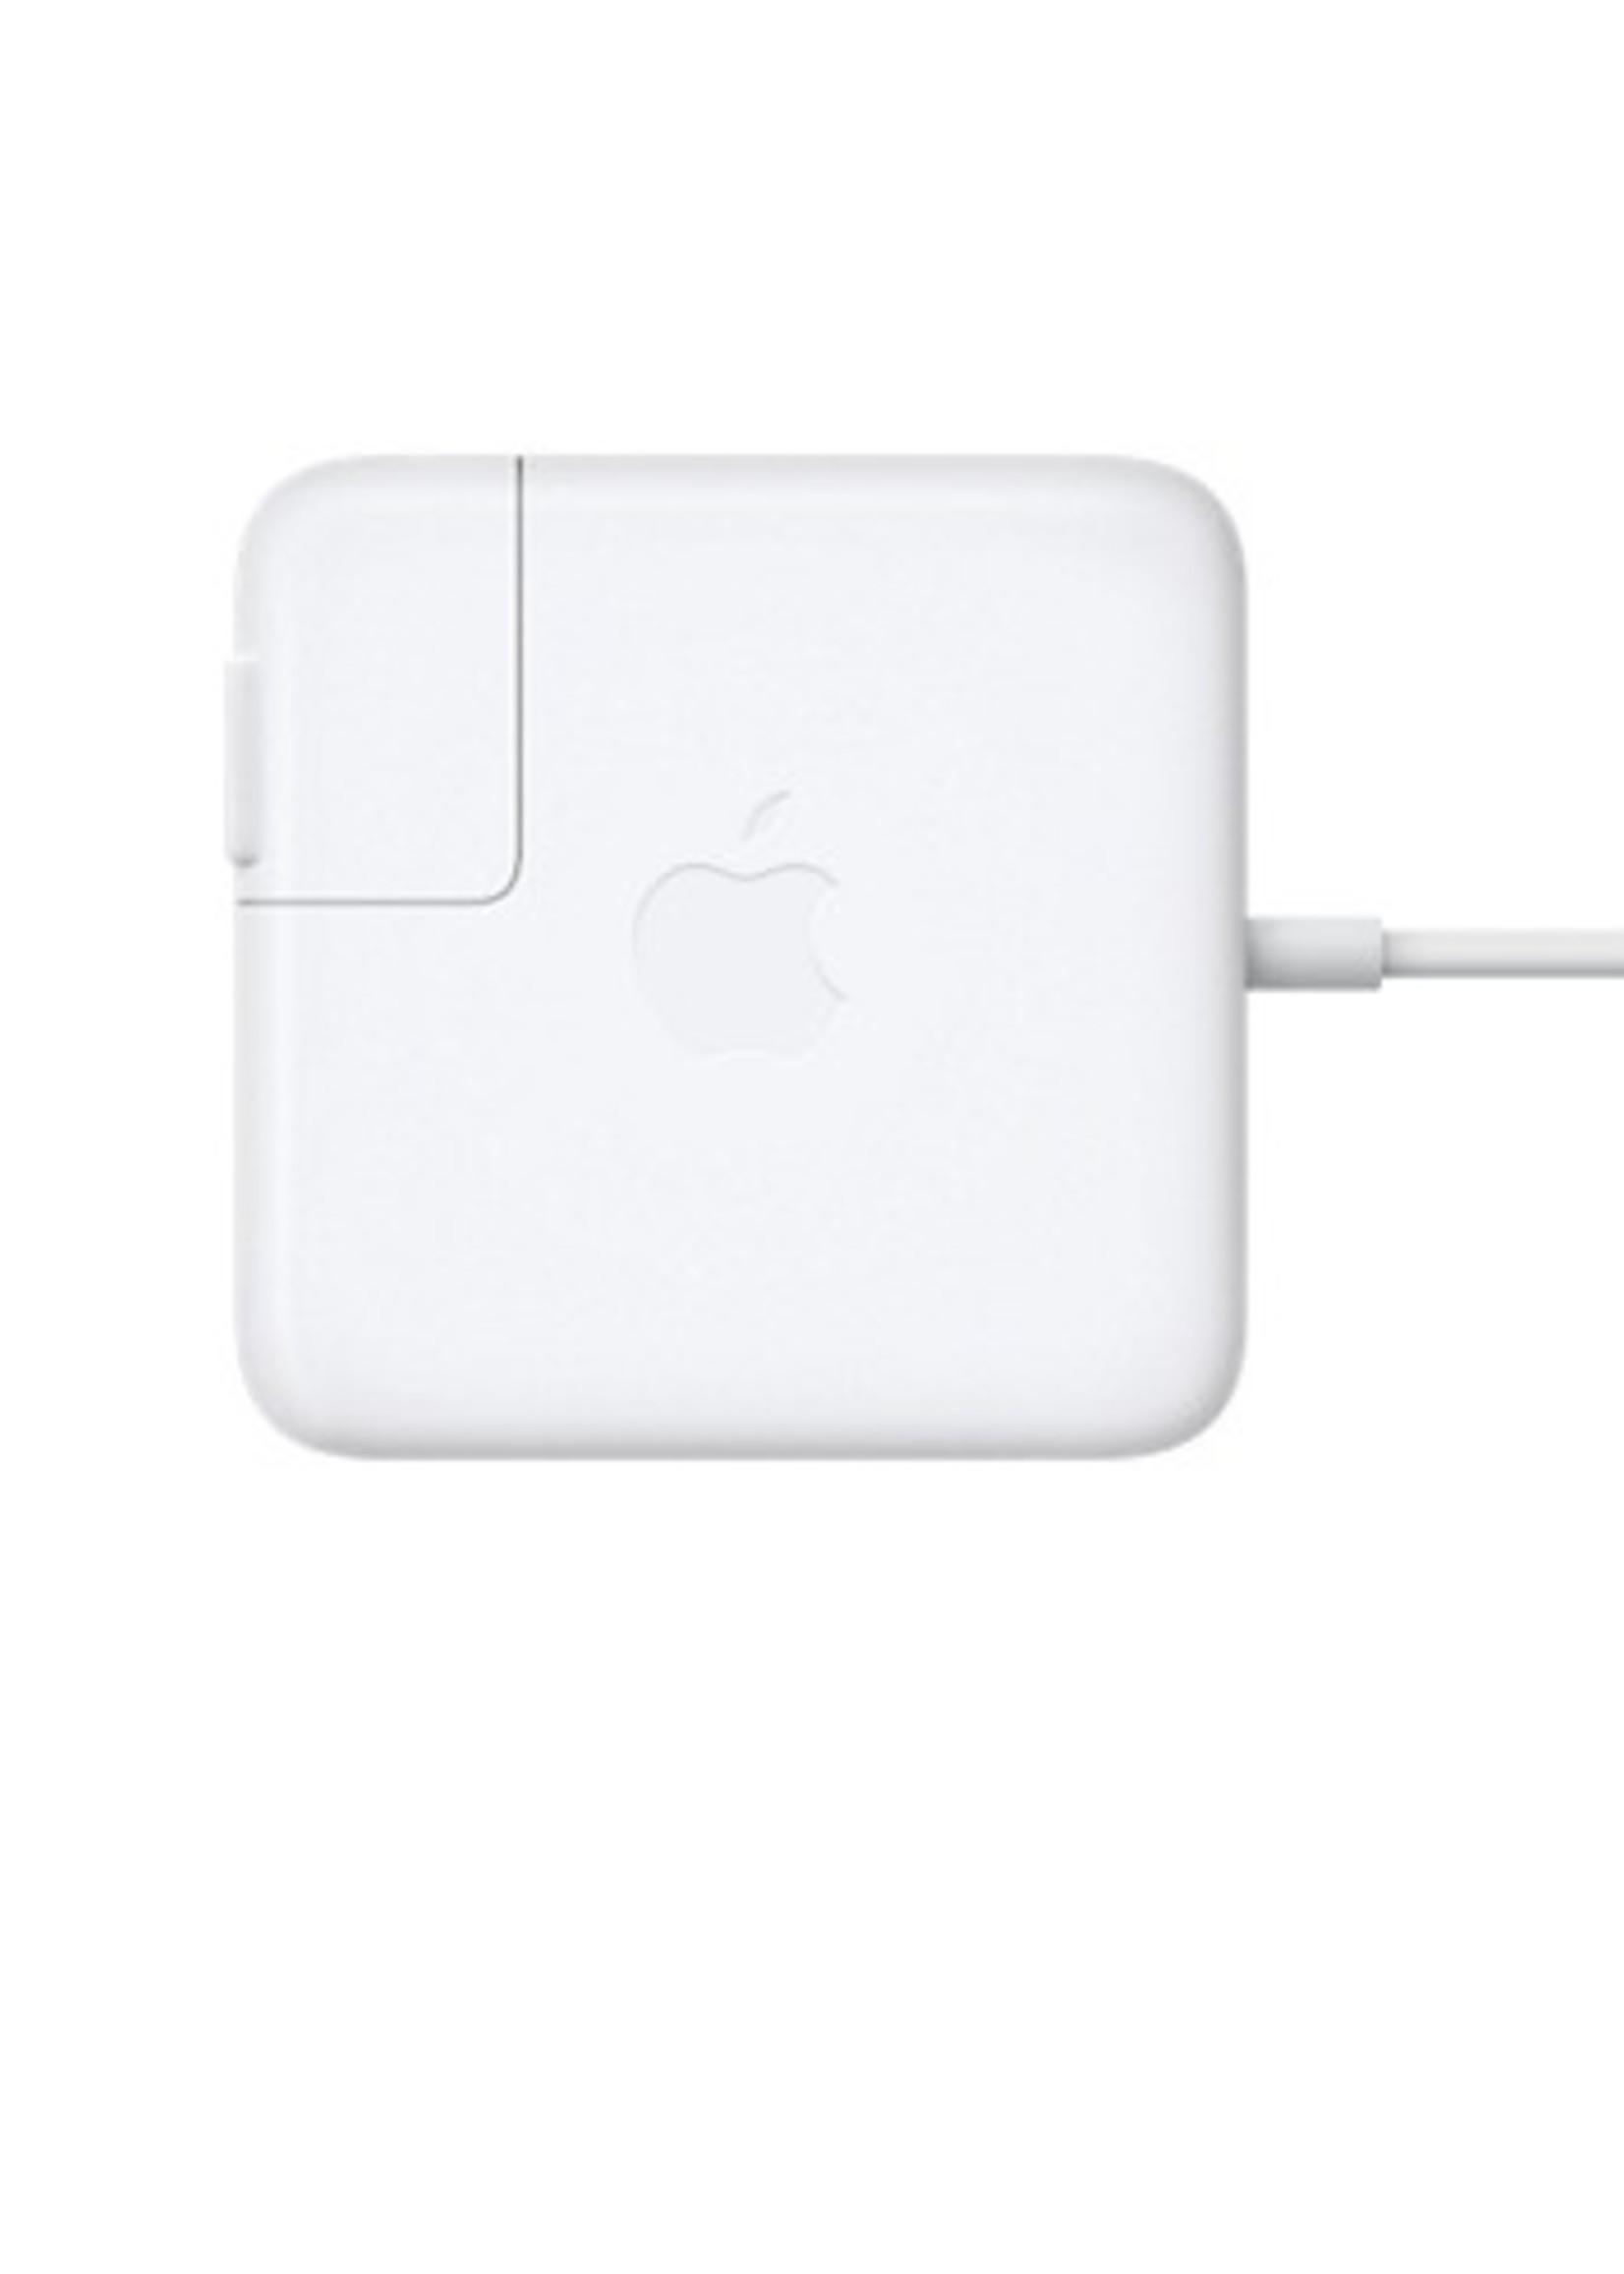 85W MagSafe 2 Power Adapter (MacBook Pro w/ Retina Display)